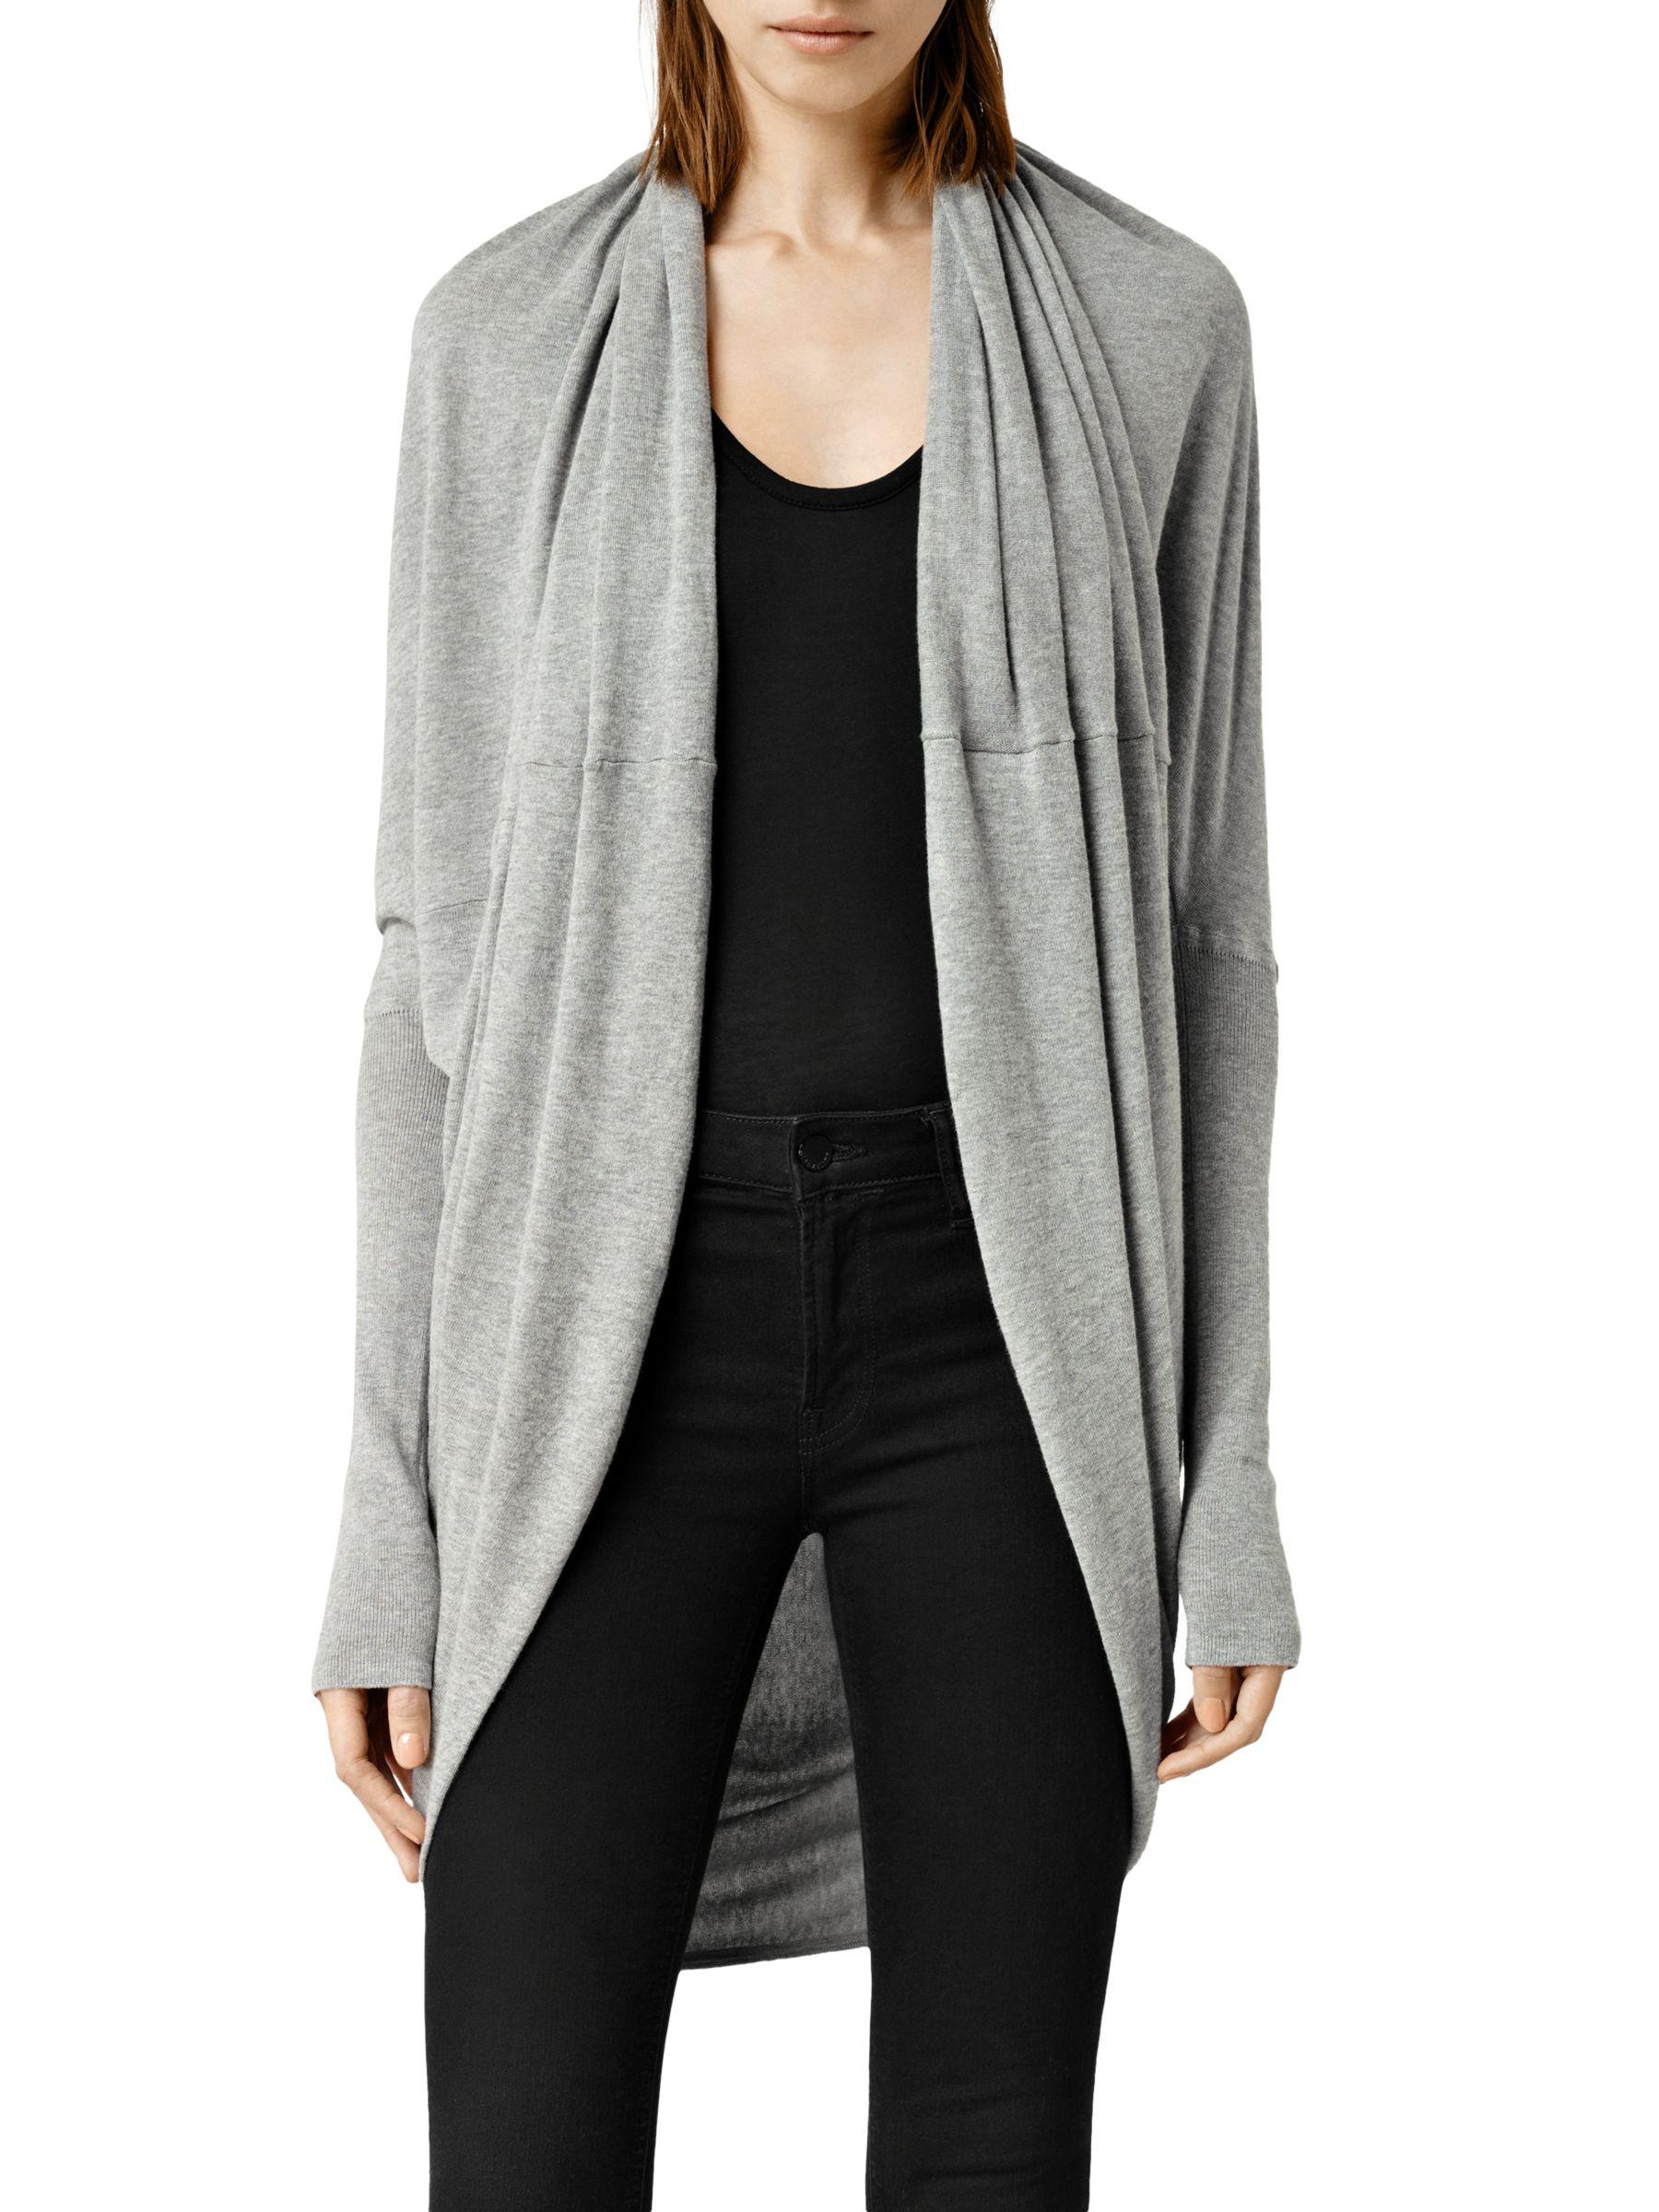 AllSaints AllSaints Itat Shrug, Grey Marl